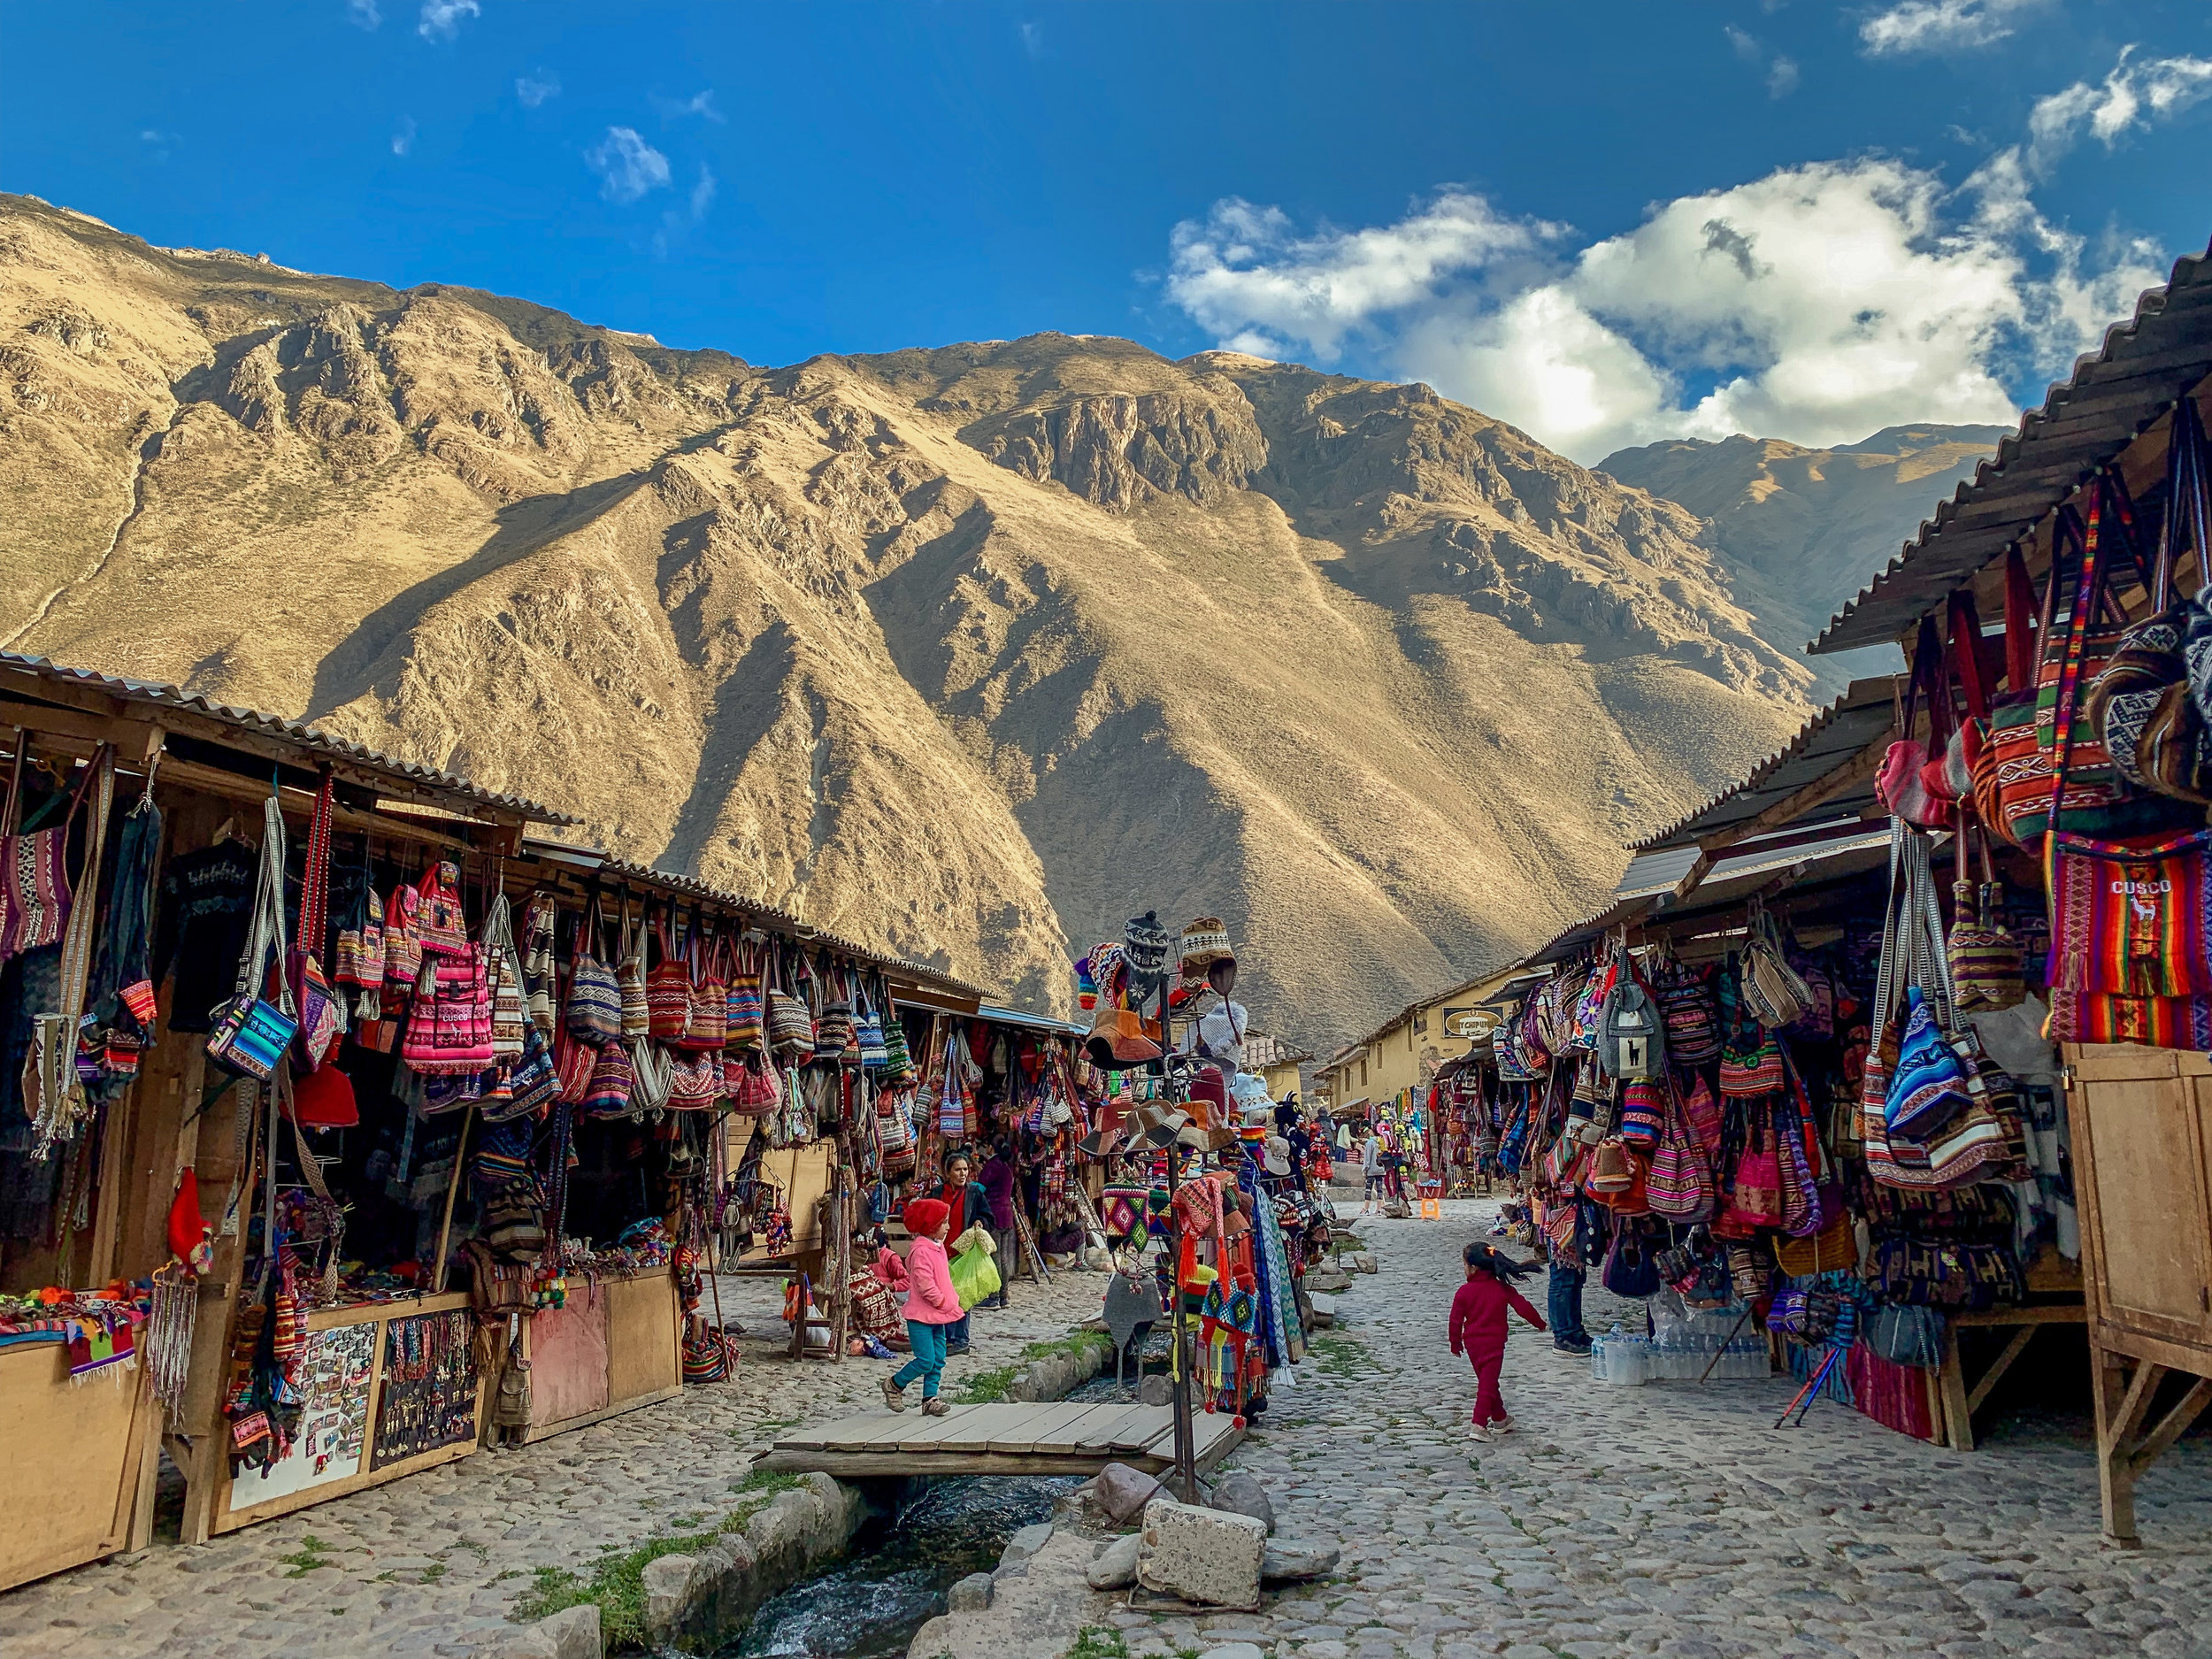 Market in the Andes - Ollantaytambo, Cusco Region